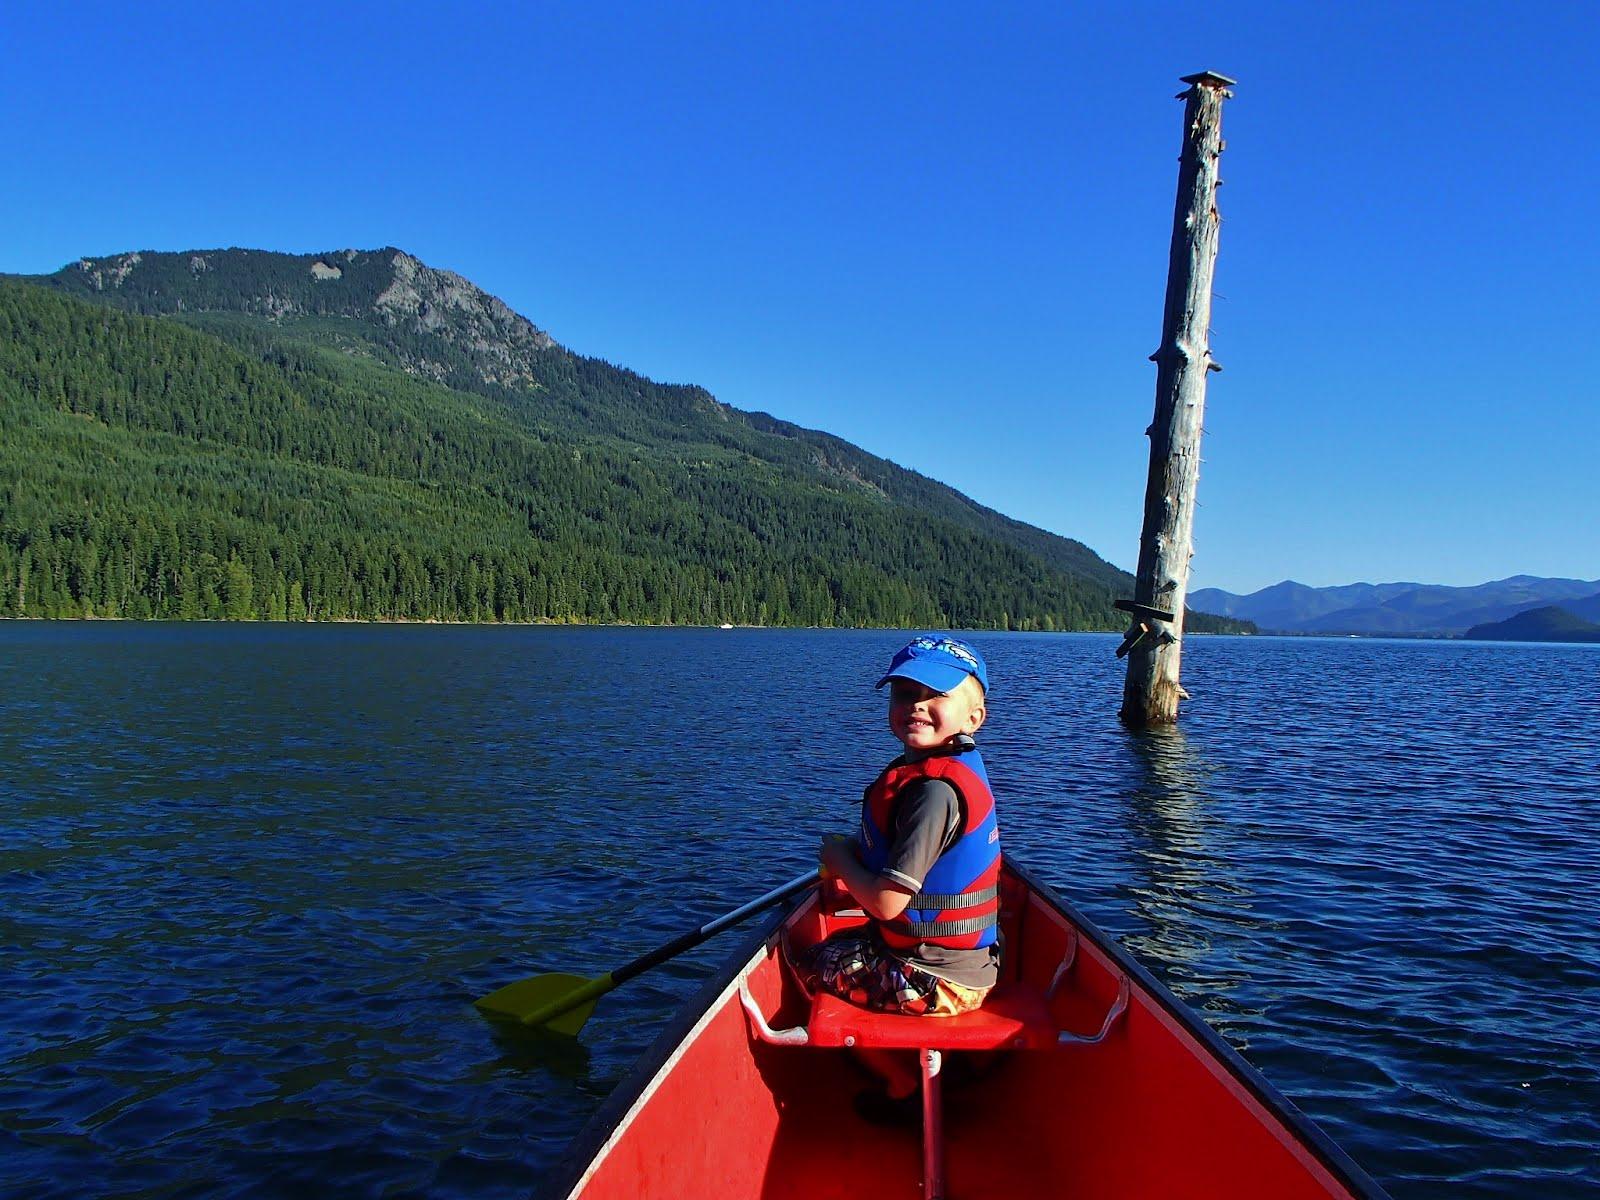 Canoe Camping On Little Kachess Lake - Washington Adventures